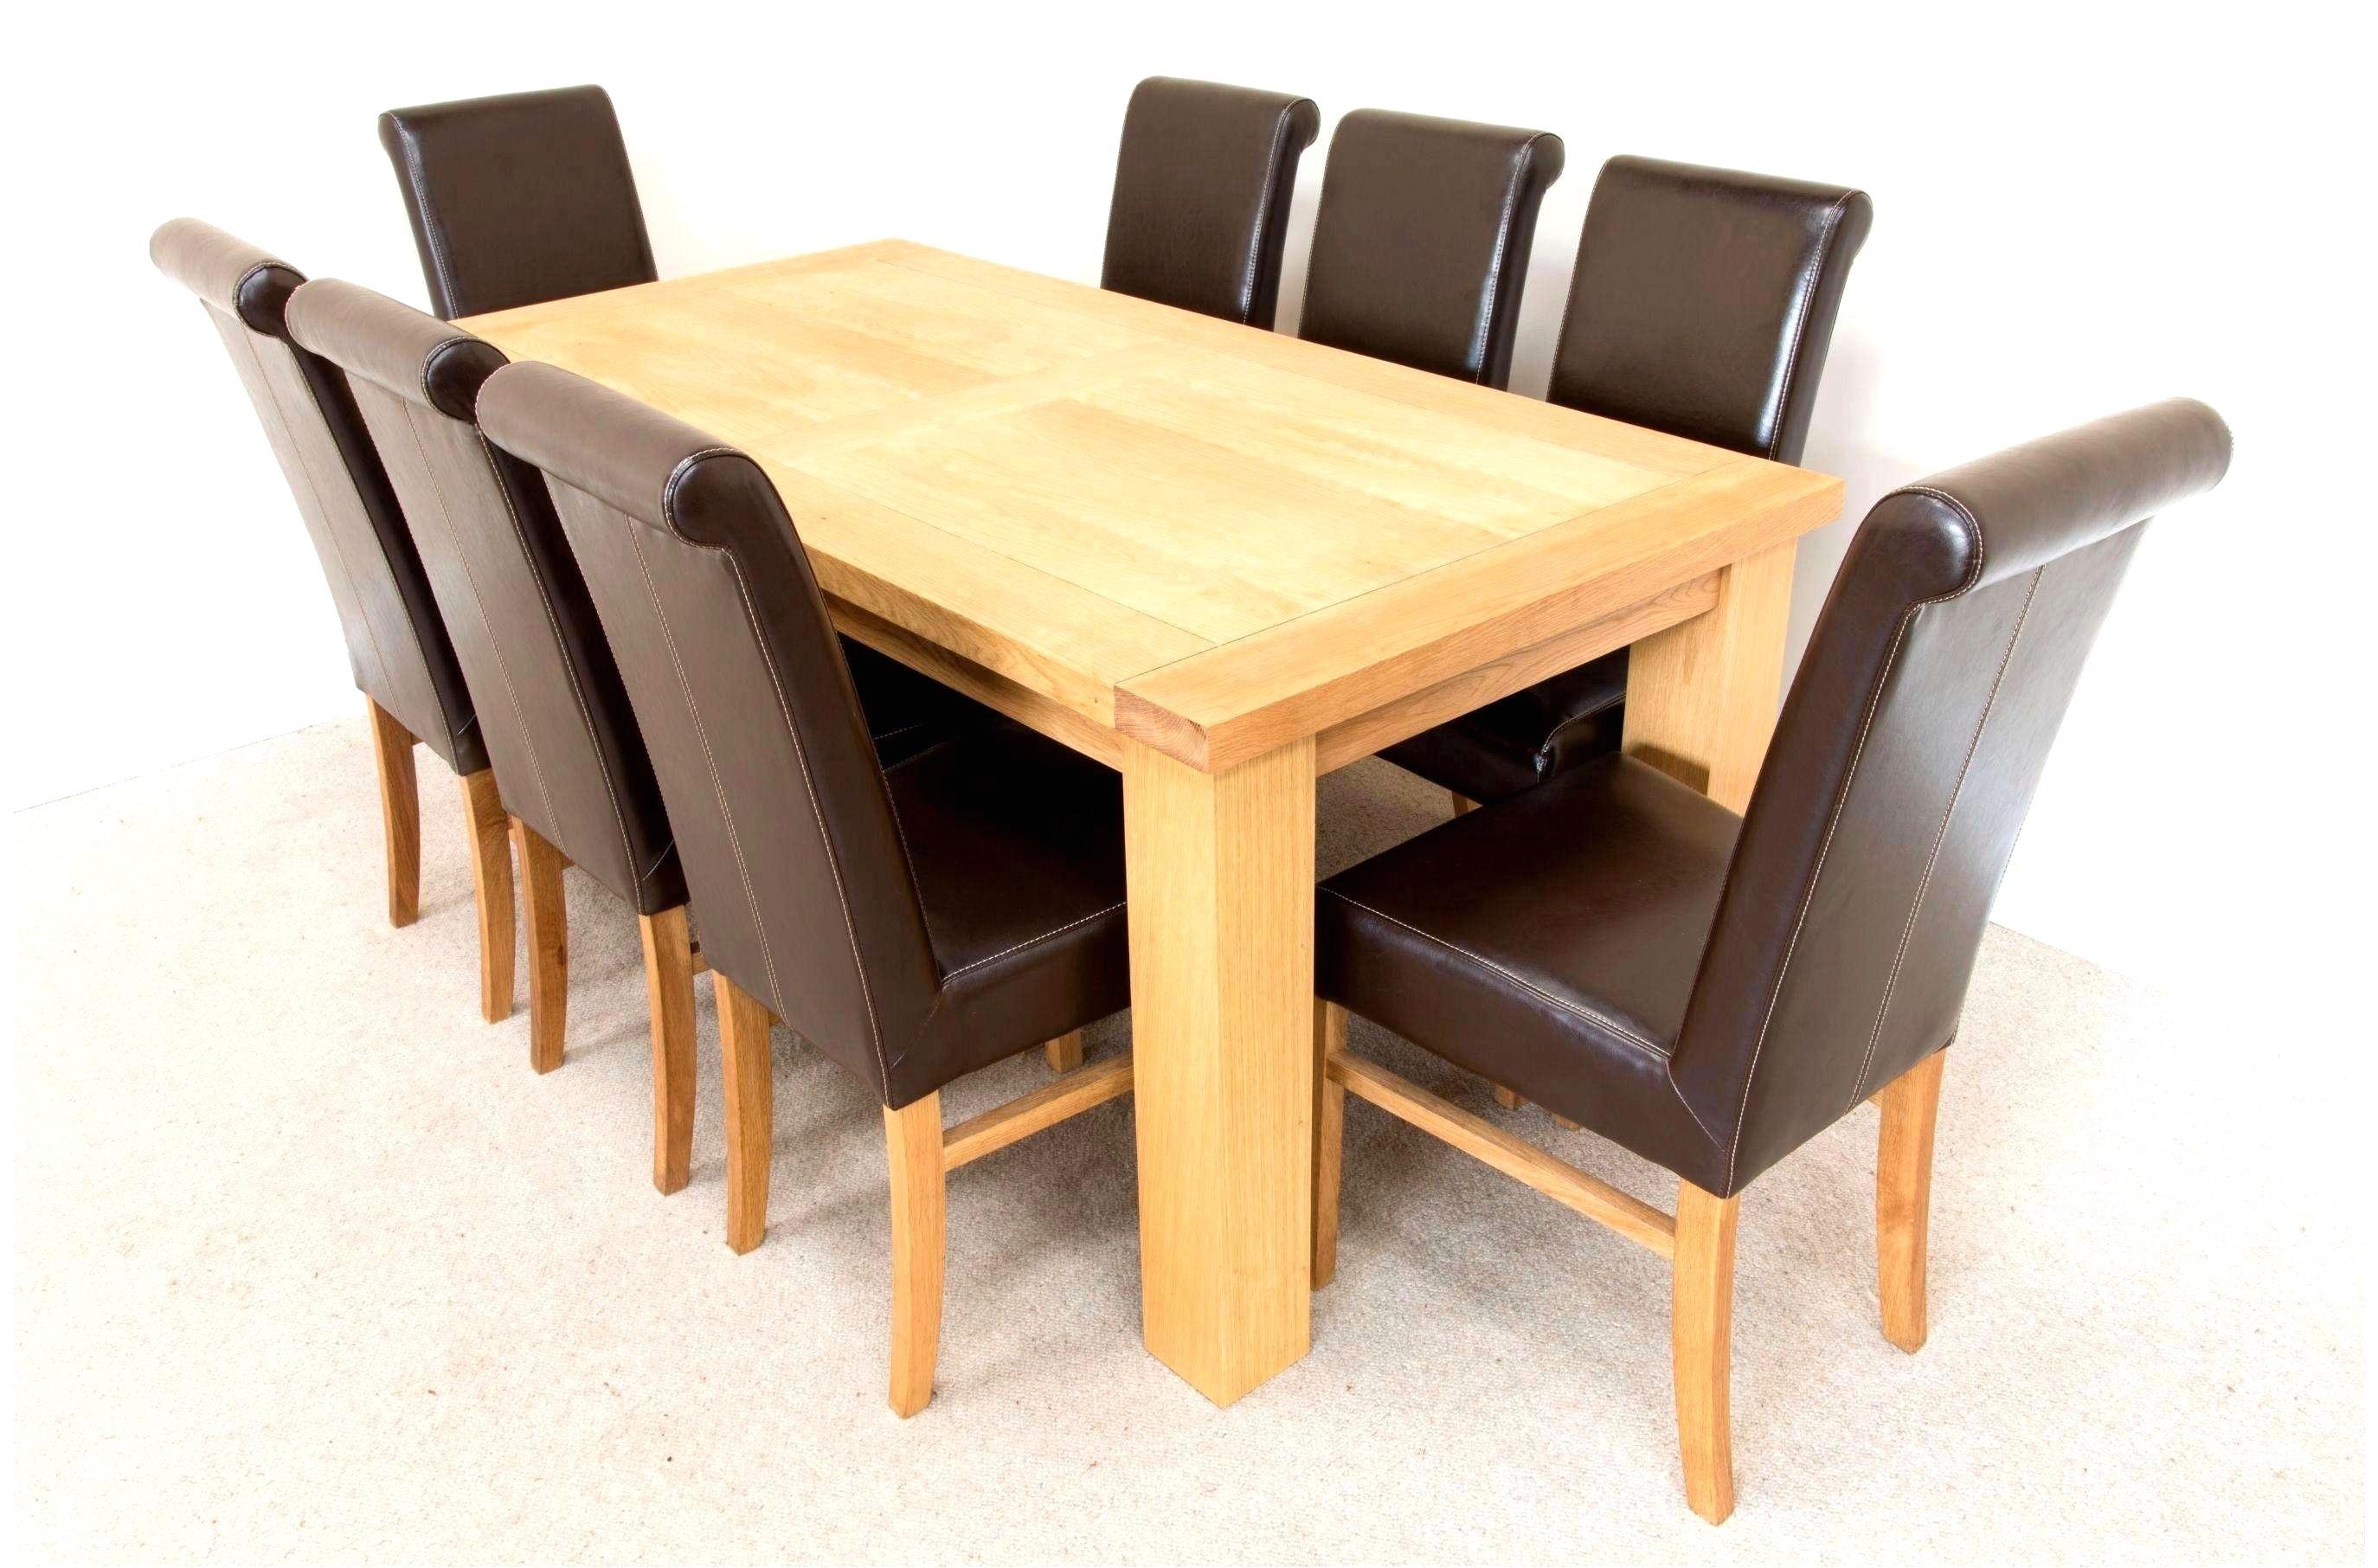 real wood dining table impressive dining room furniture solid oak wood ideas od ideas nt